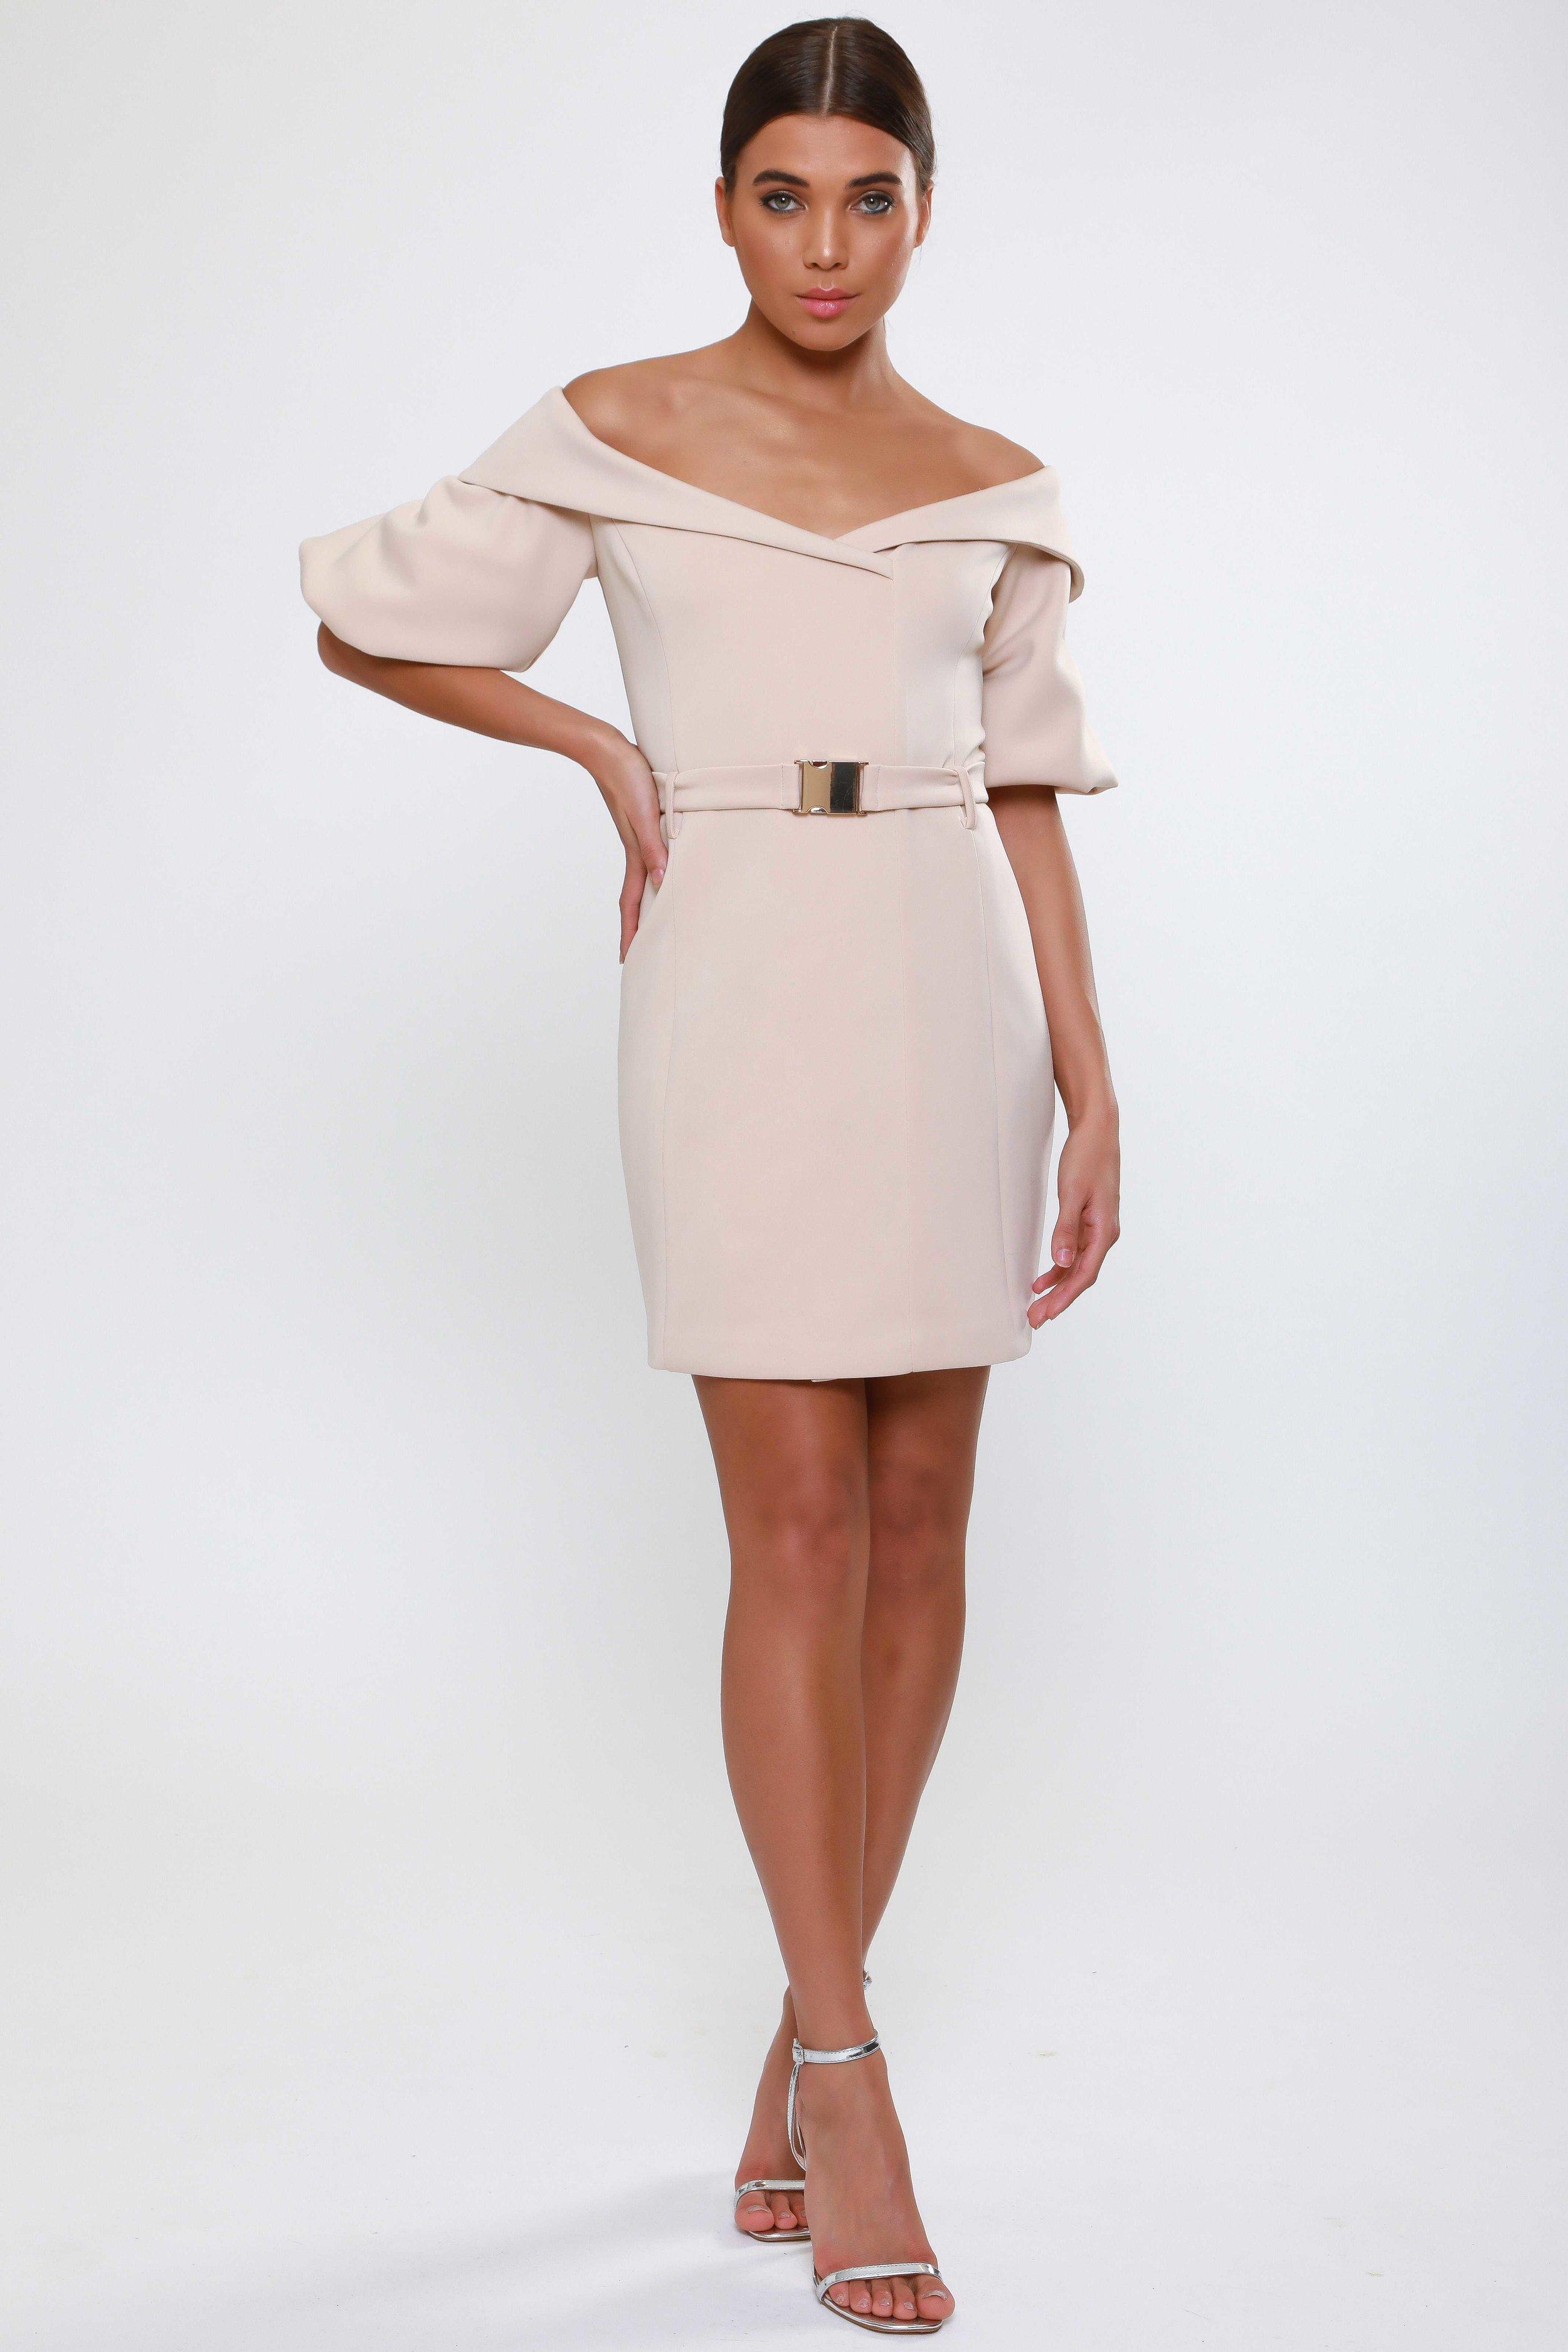 Puff Sleeve Blazer Dress  with Gold Hardware Belt   £65.00